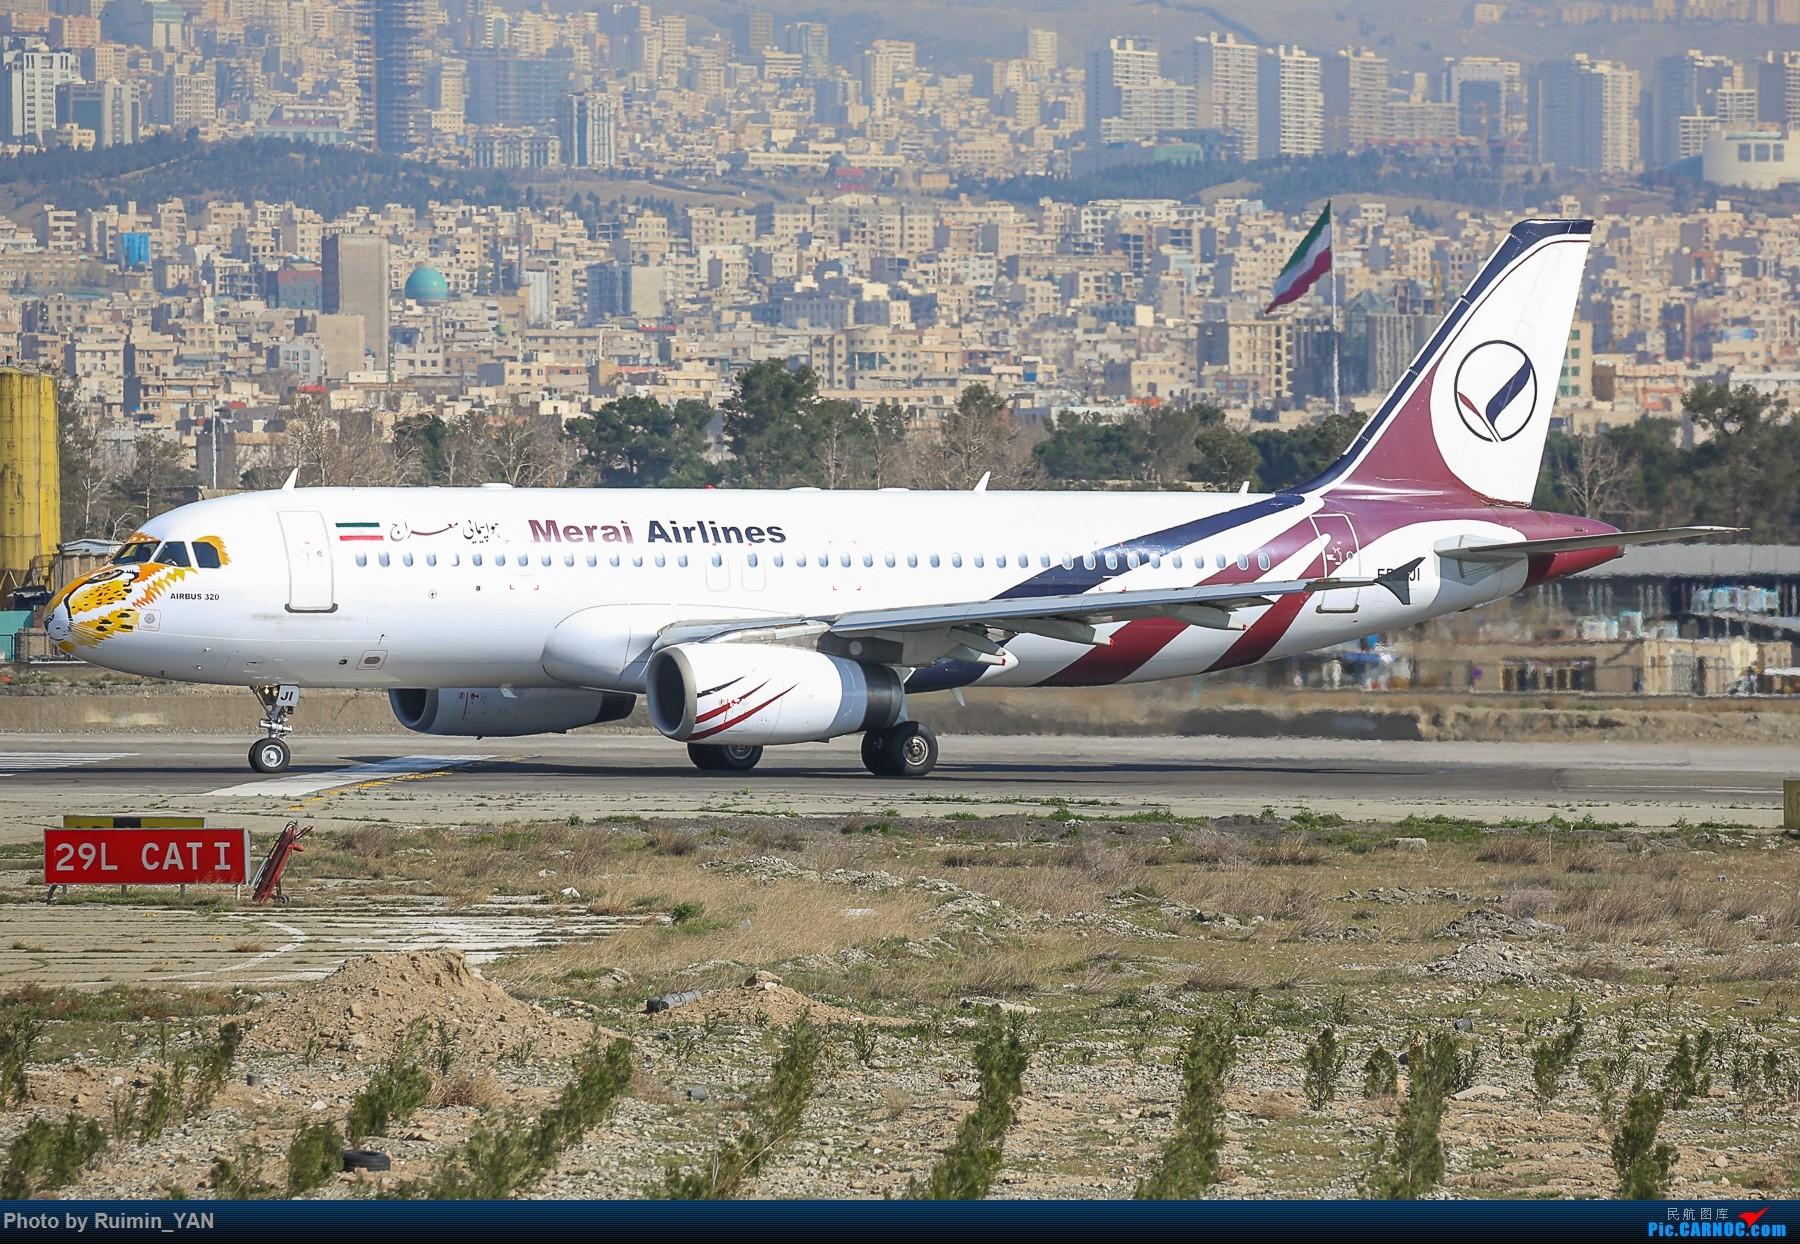 Re:[原创]【THR】(德黑兰梅赫拉巴德机场)伊朗Meraj航空(Meraj Airlines,IJ)野生动物彩绘--空客320 AIRBUS A320-200 EP-AJI 伊朗德黑兰机场